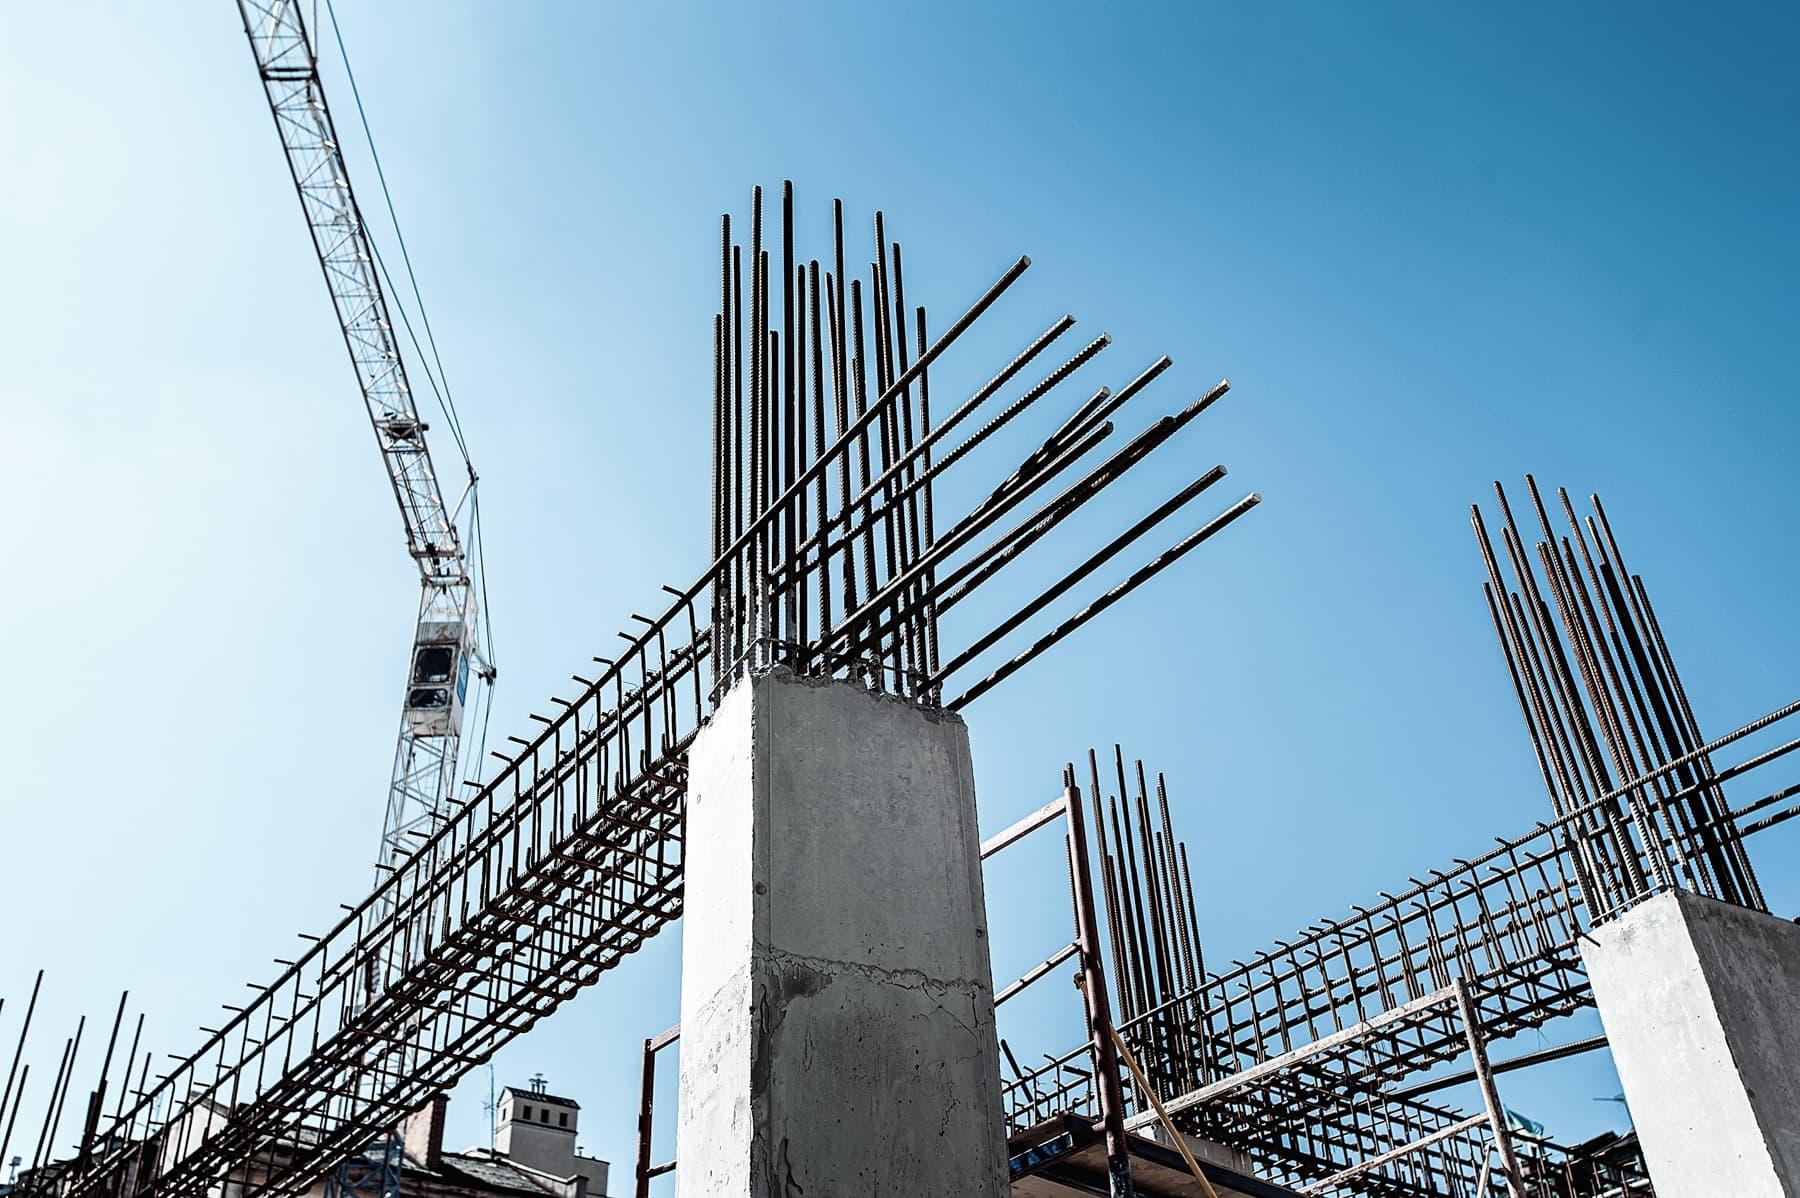 Ingenieurbüro Nebel - Statik - Architekten - Ingenieurbüro Projekte